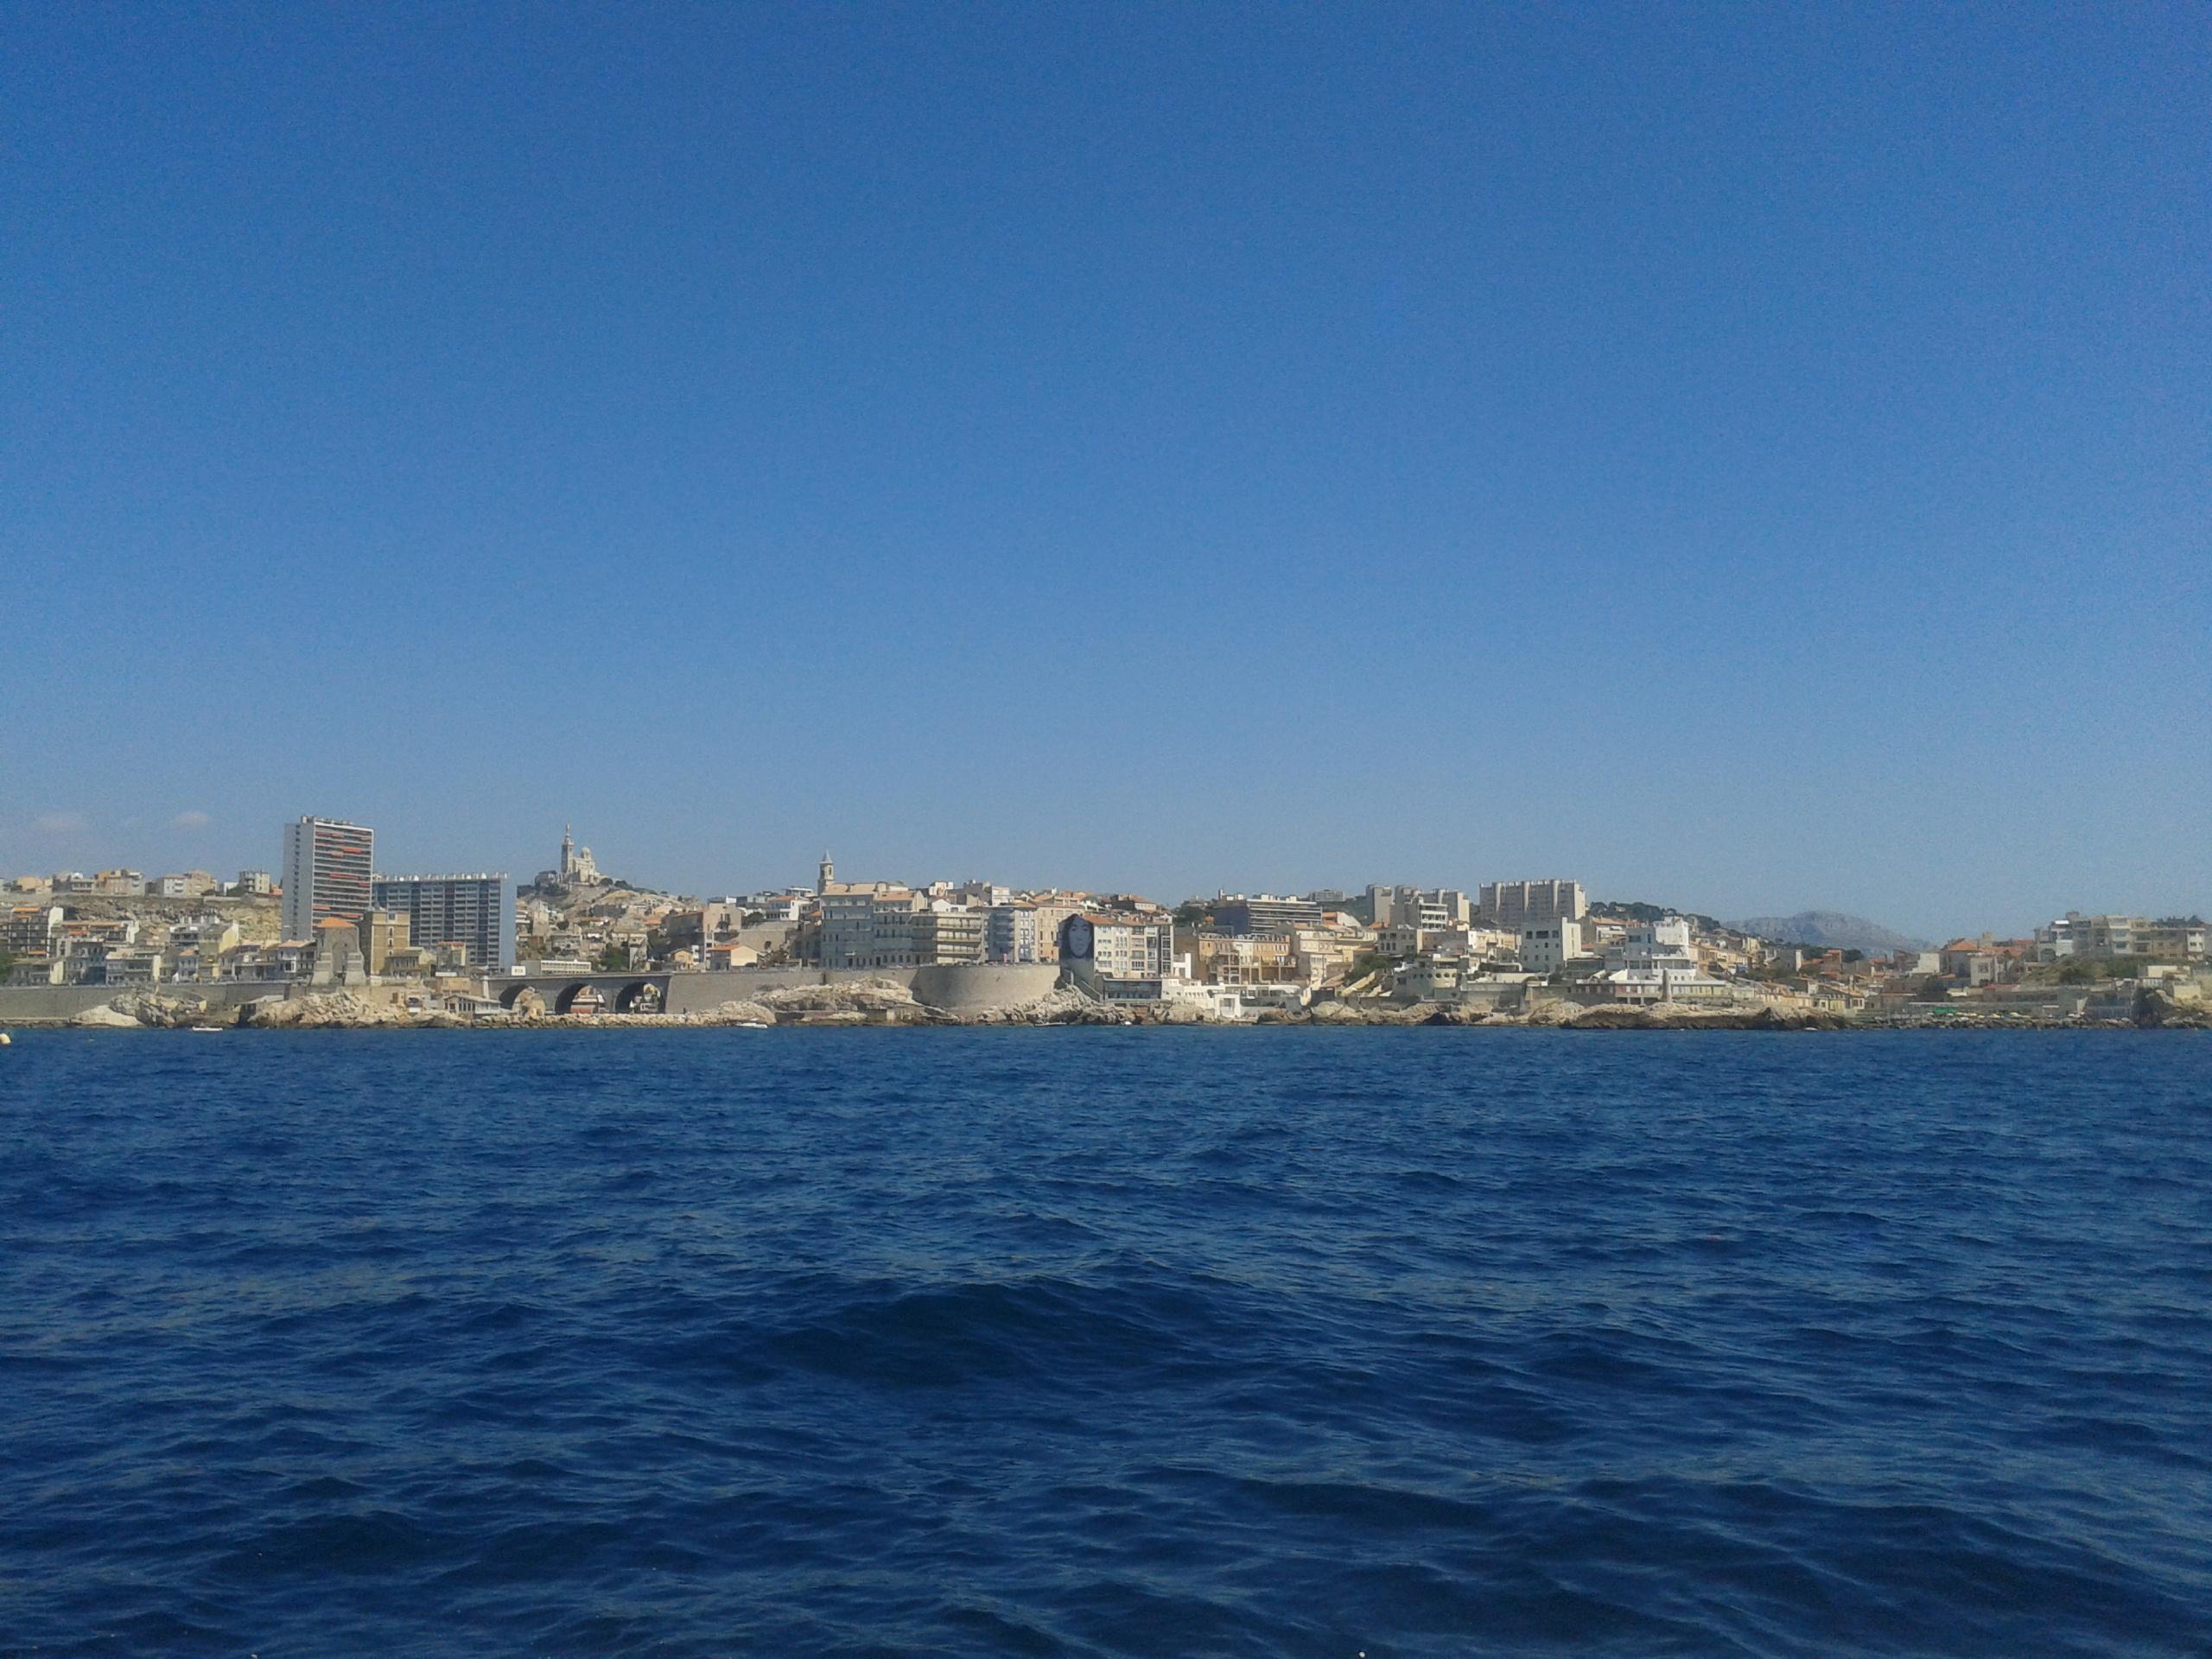 Balade en navette maritime pointe rouge vieux port - Navette vieux port pointe rouge marseille ...